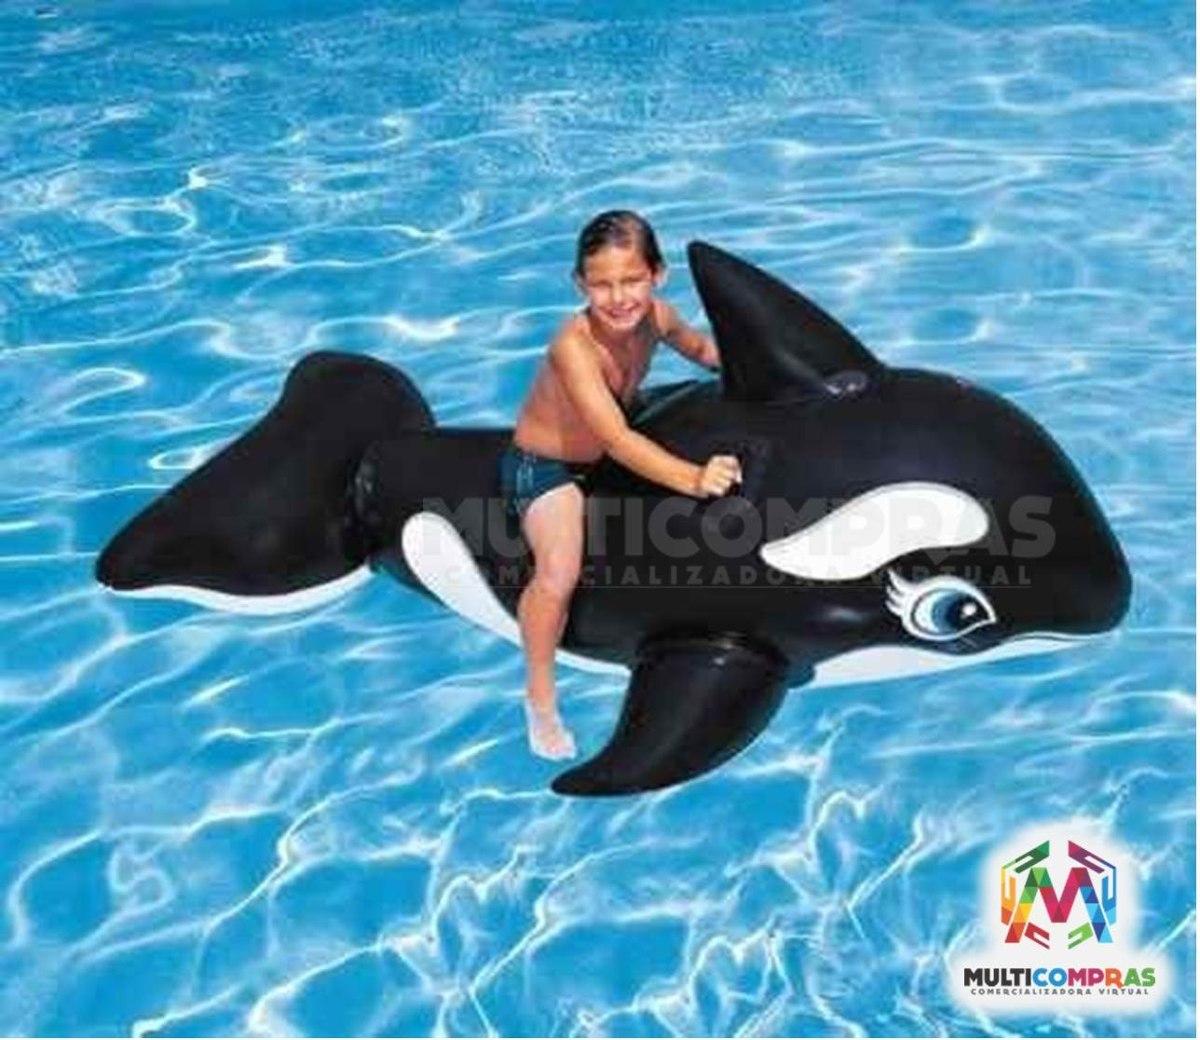 Juegos orcas beautiful ballena delfin orca inflable bestway x cm stunning colectivo loco - Playmobil piscina ballena ...